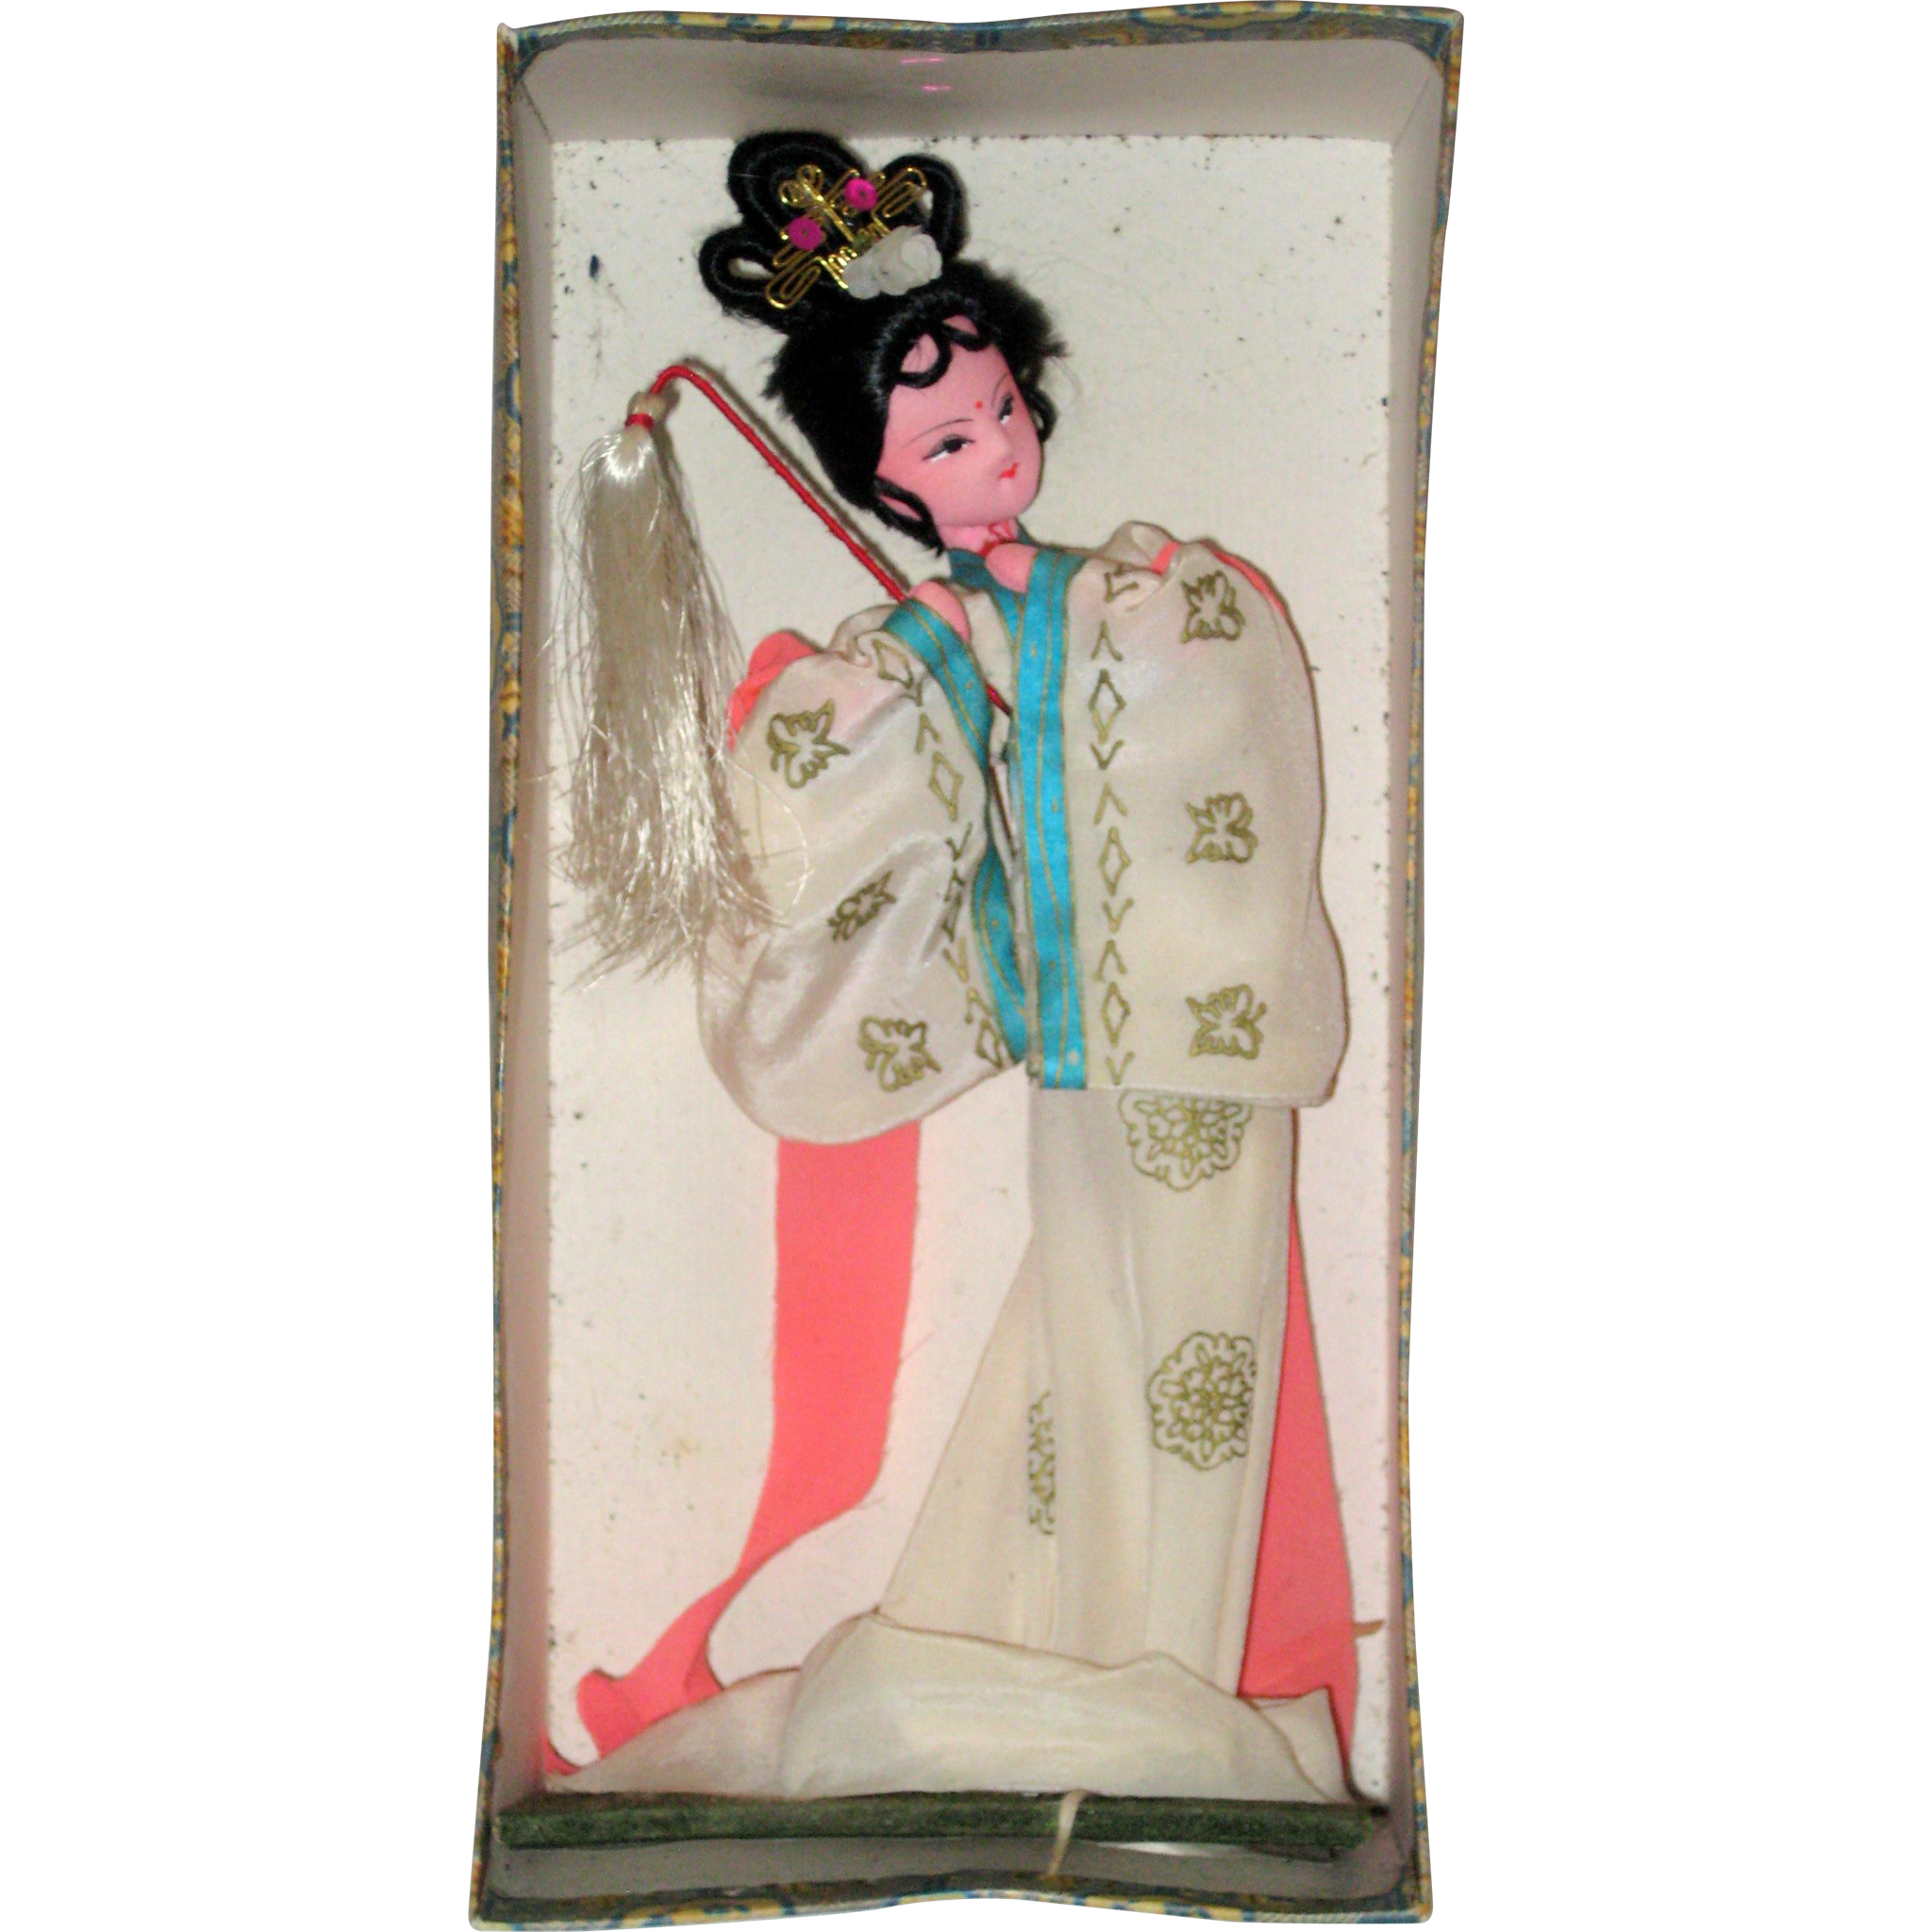 Chinese Dancer Doll in Original Box - Beijing 1970's